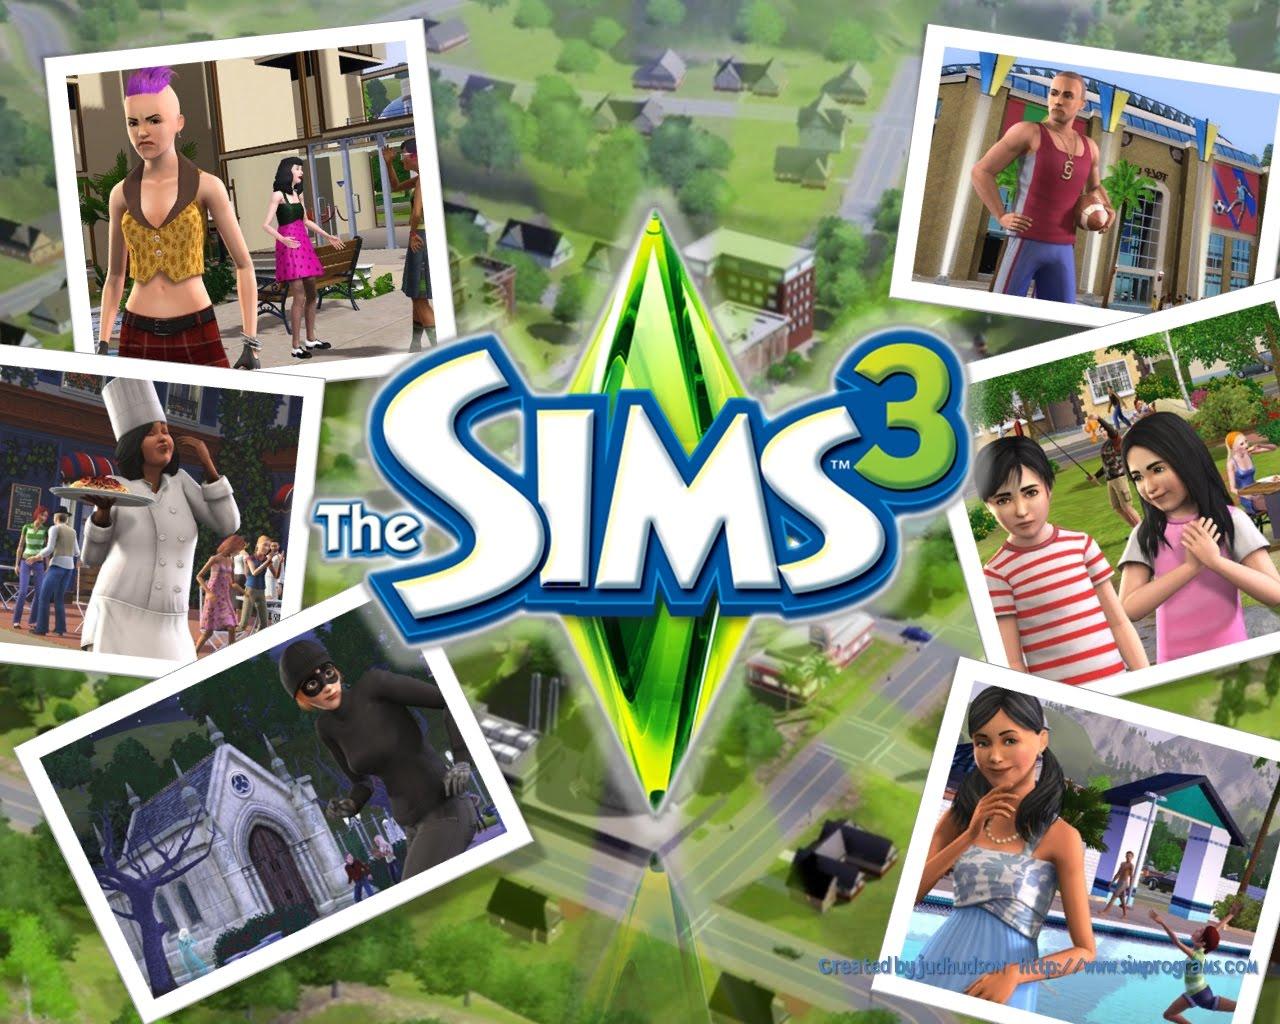 the sims 3 wallpaper hd 1280x1024